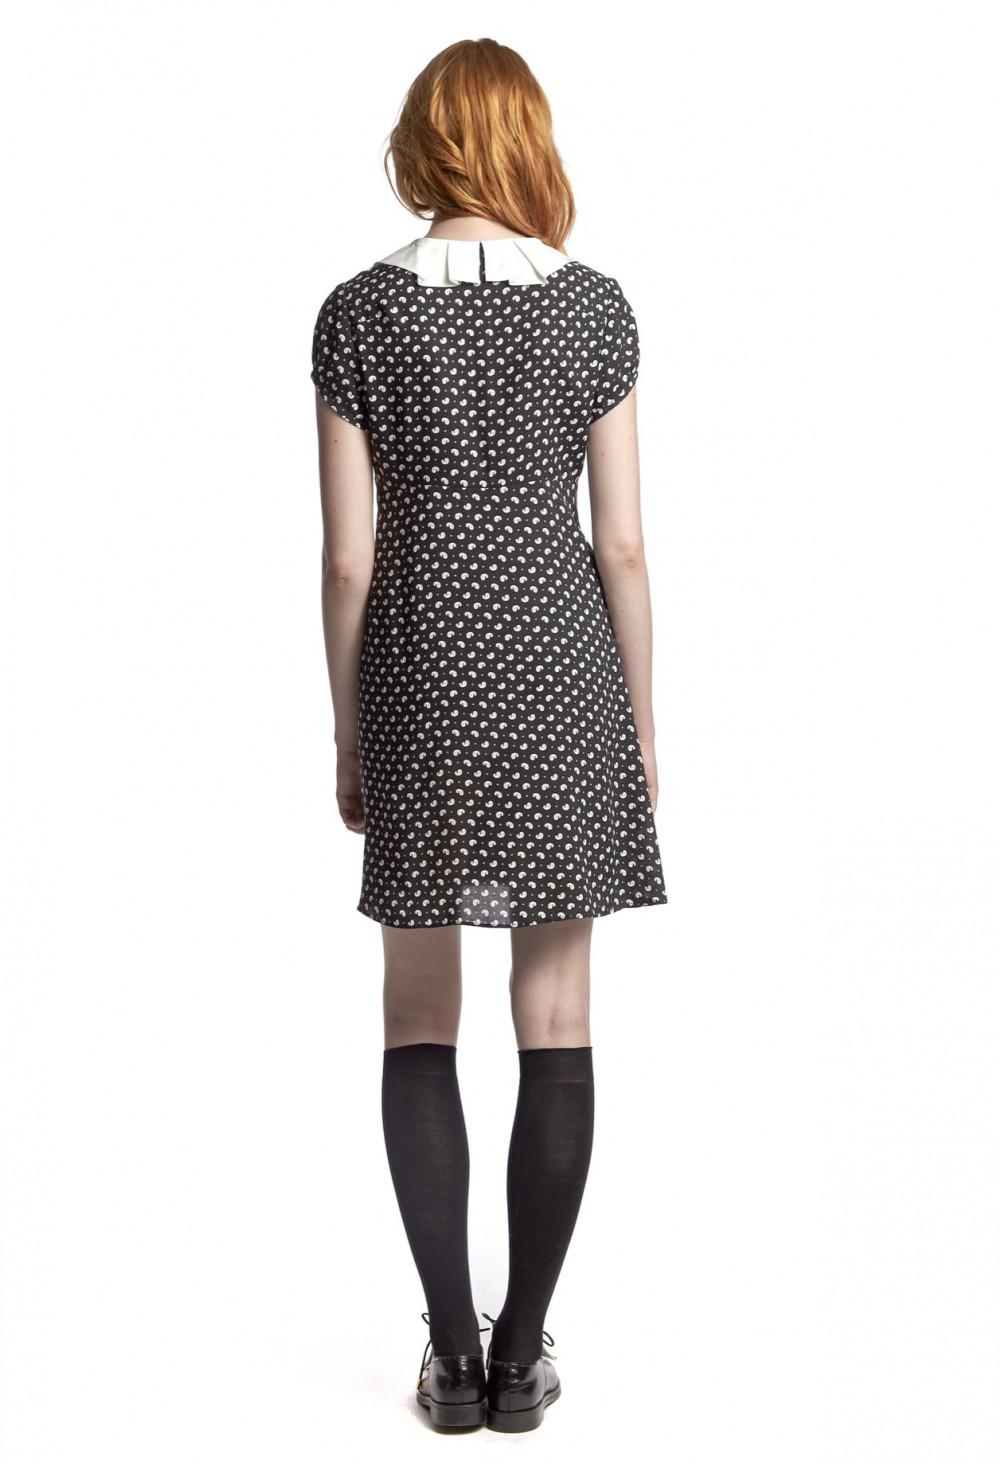 RIVIERE Dress